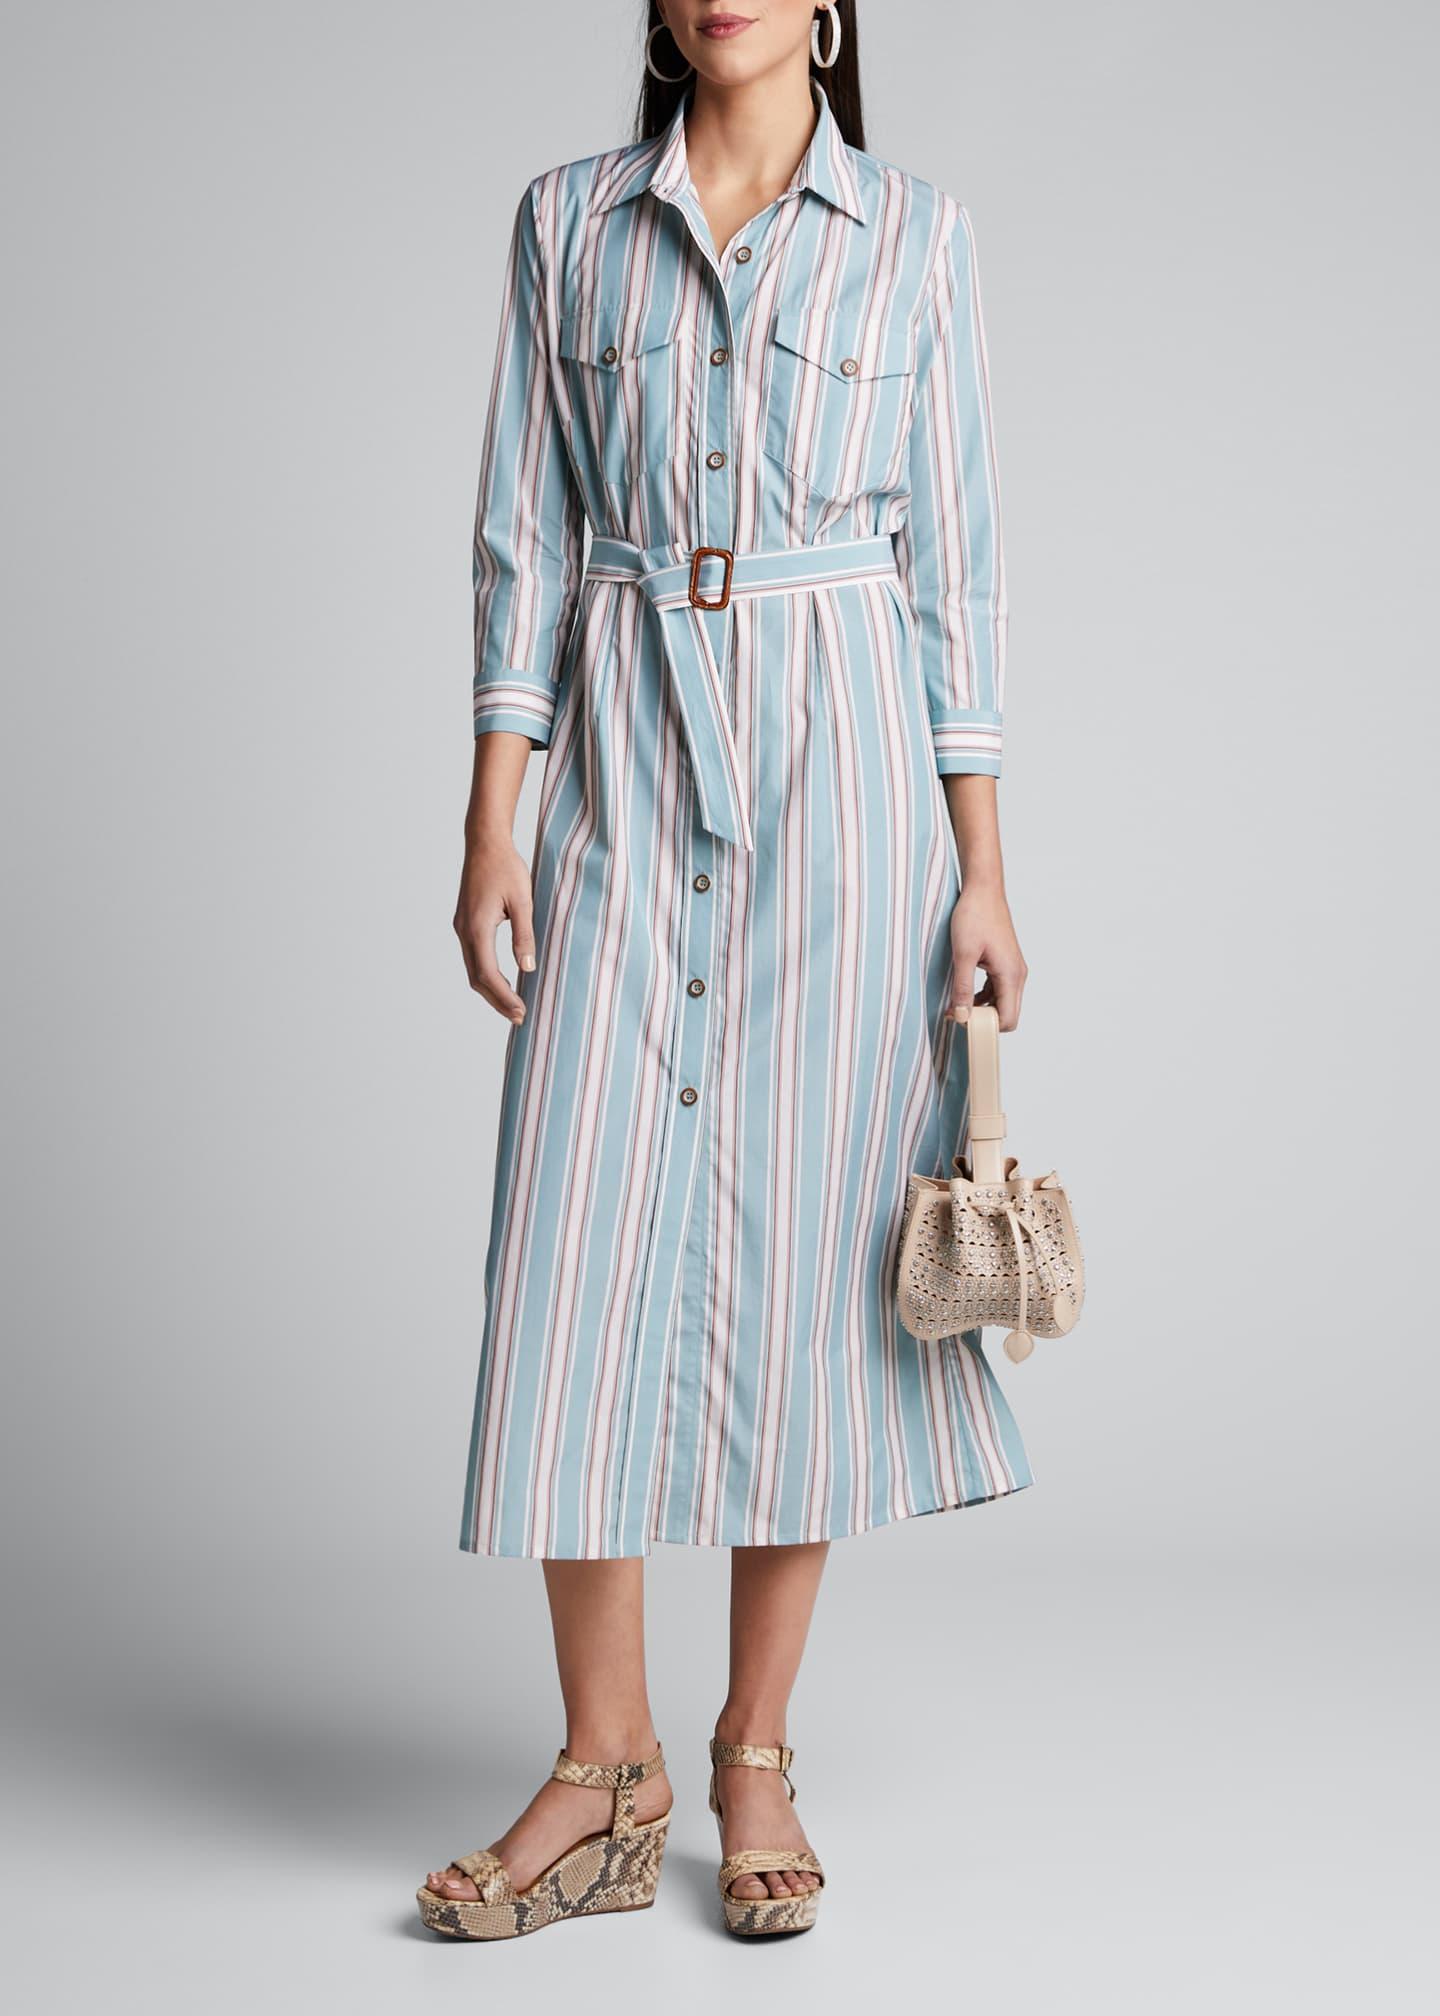 Evi Grintela Laurel Striped Bracelet-Sleeve Shirtdress